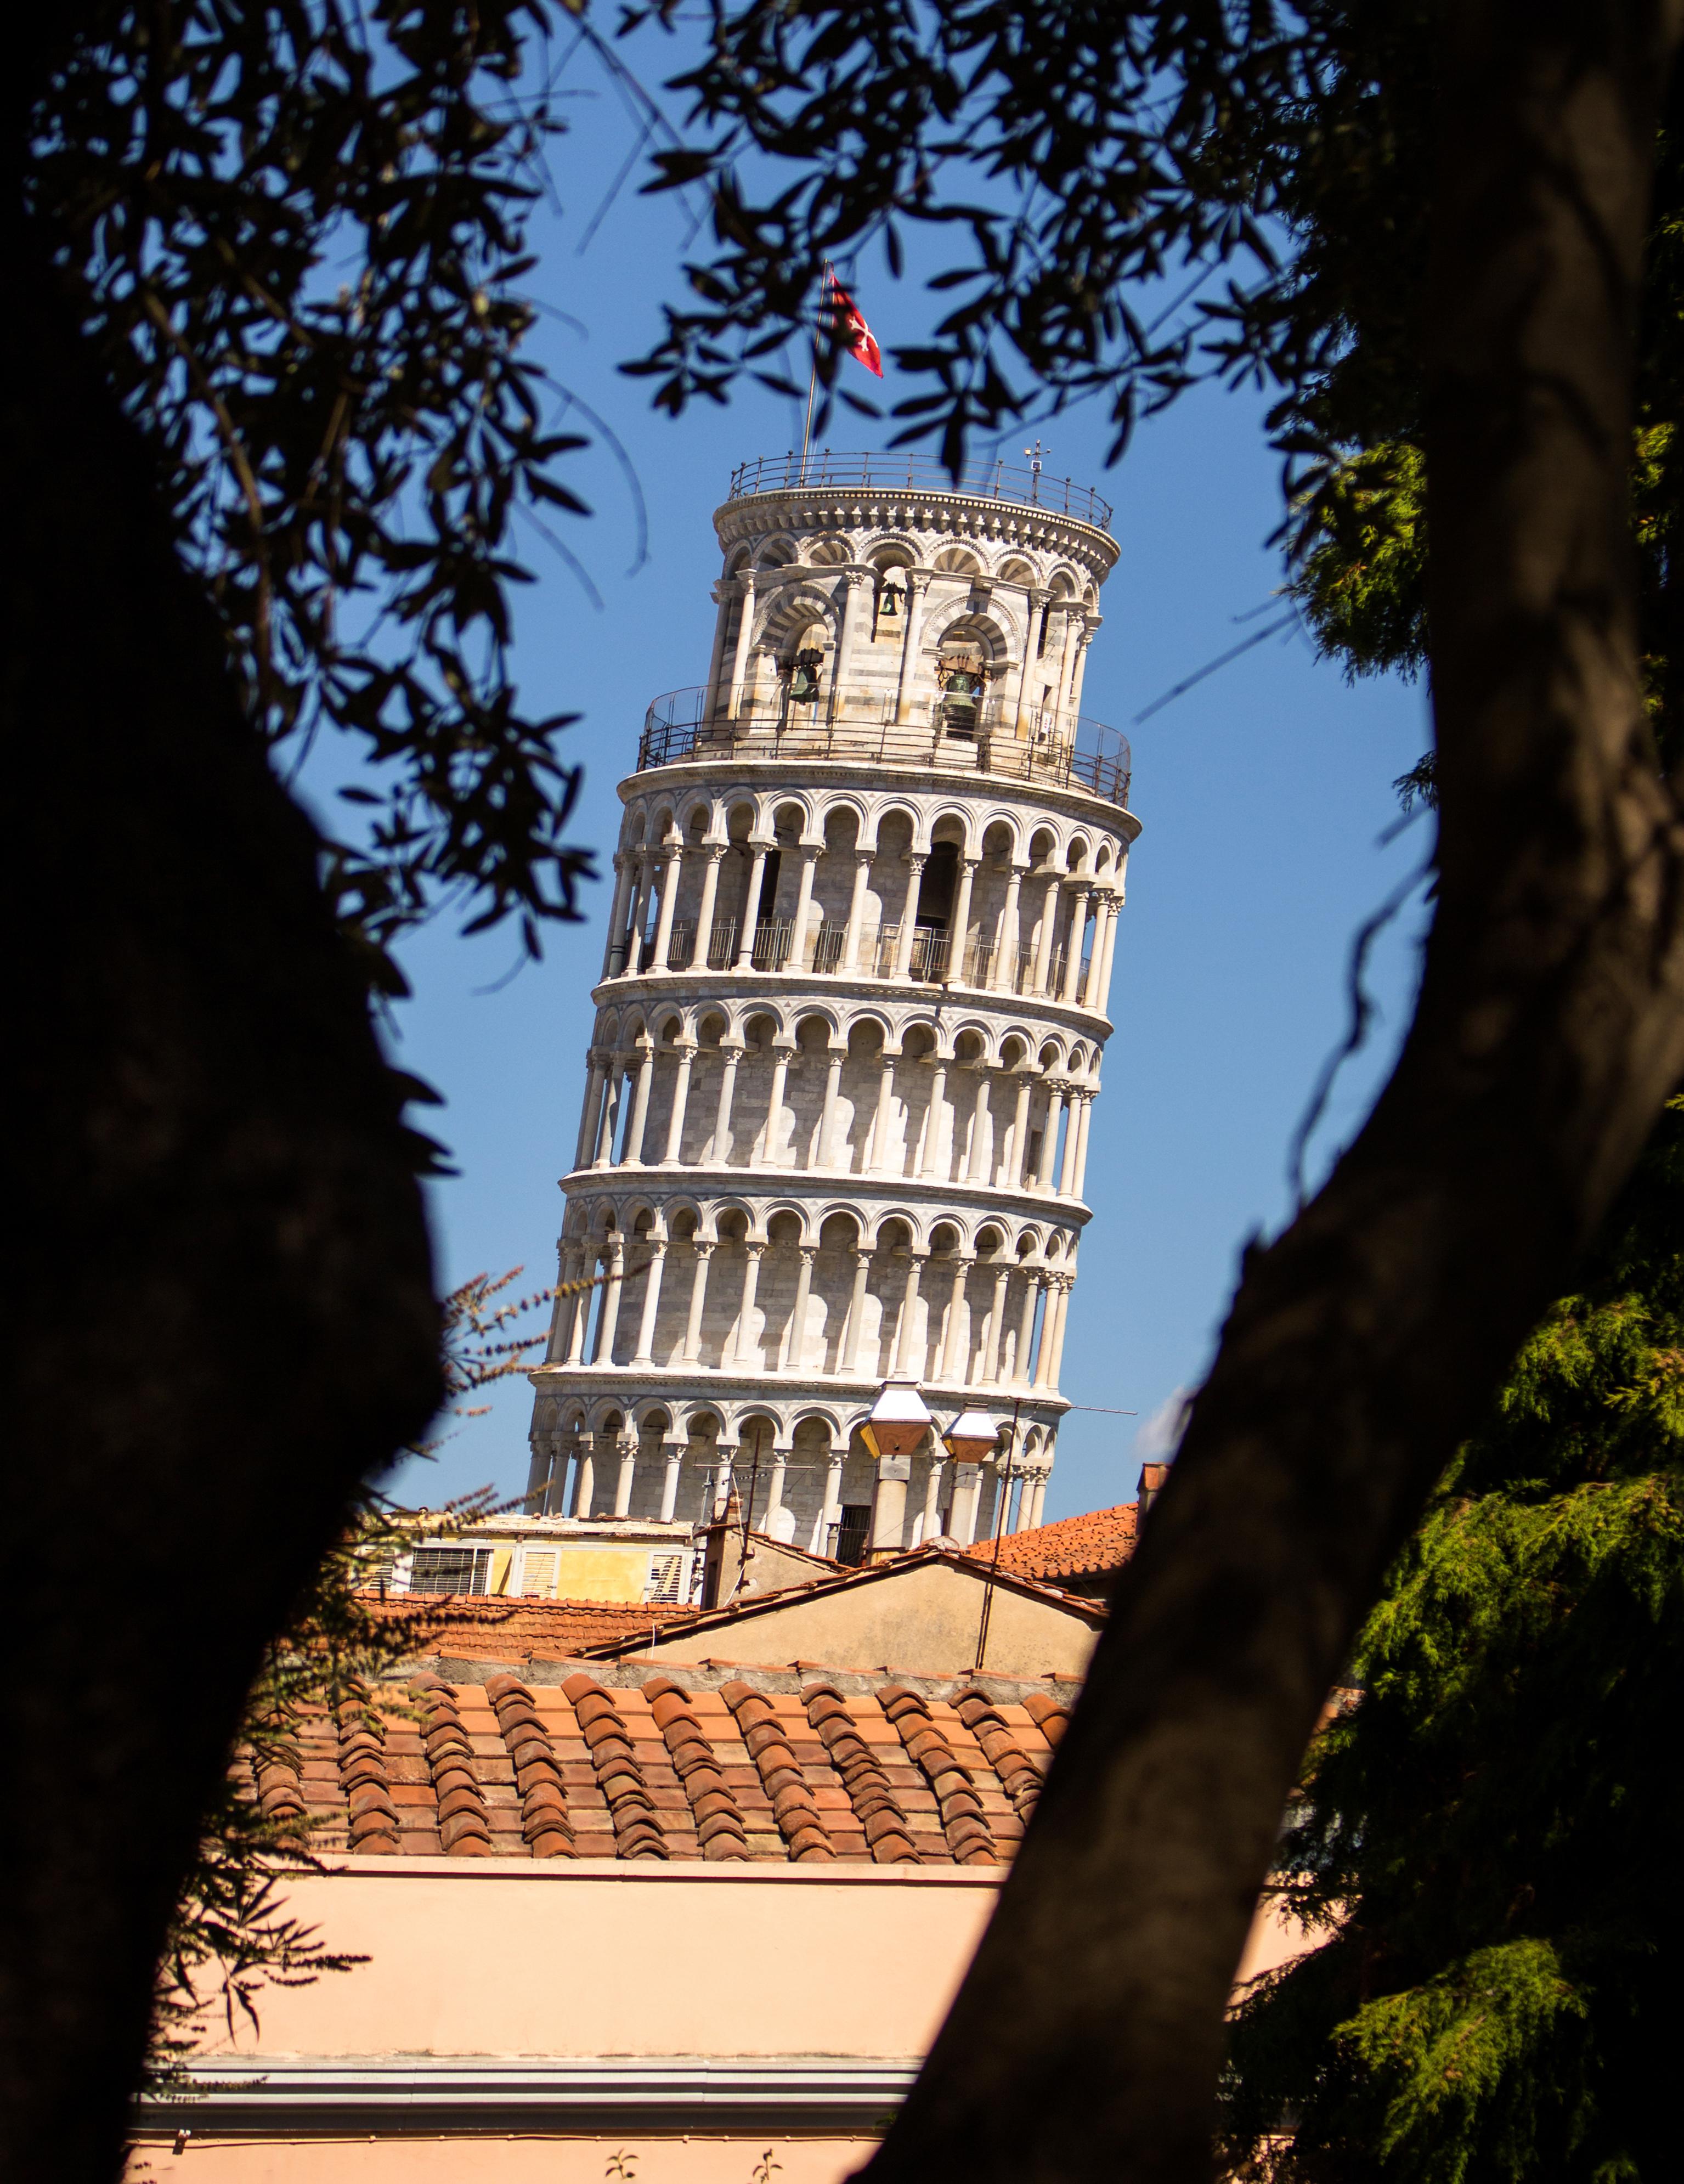 Un tesoro verde a un tiro de piedra de la Torre Inclinada - Italia Circuito Italia Bella: de Milán a Roma